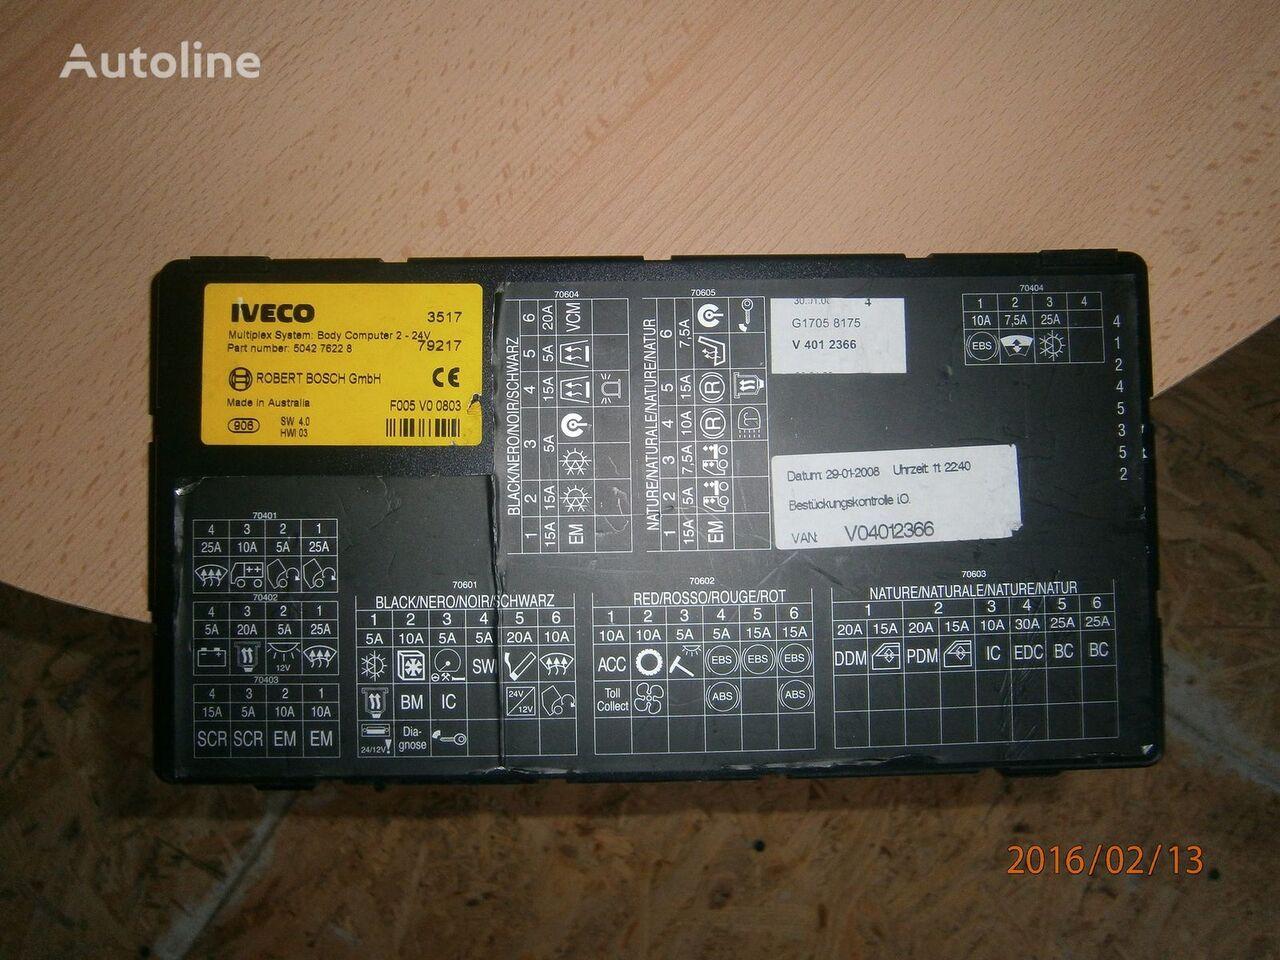 upravljačka jedinica IVECO EURO5 Multiplex system body computer 504276228 za tegljača IVECO Stralis